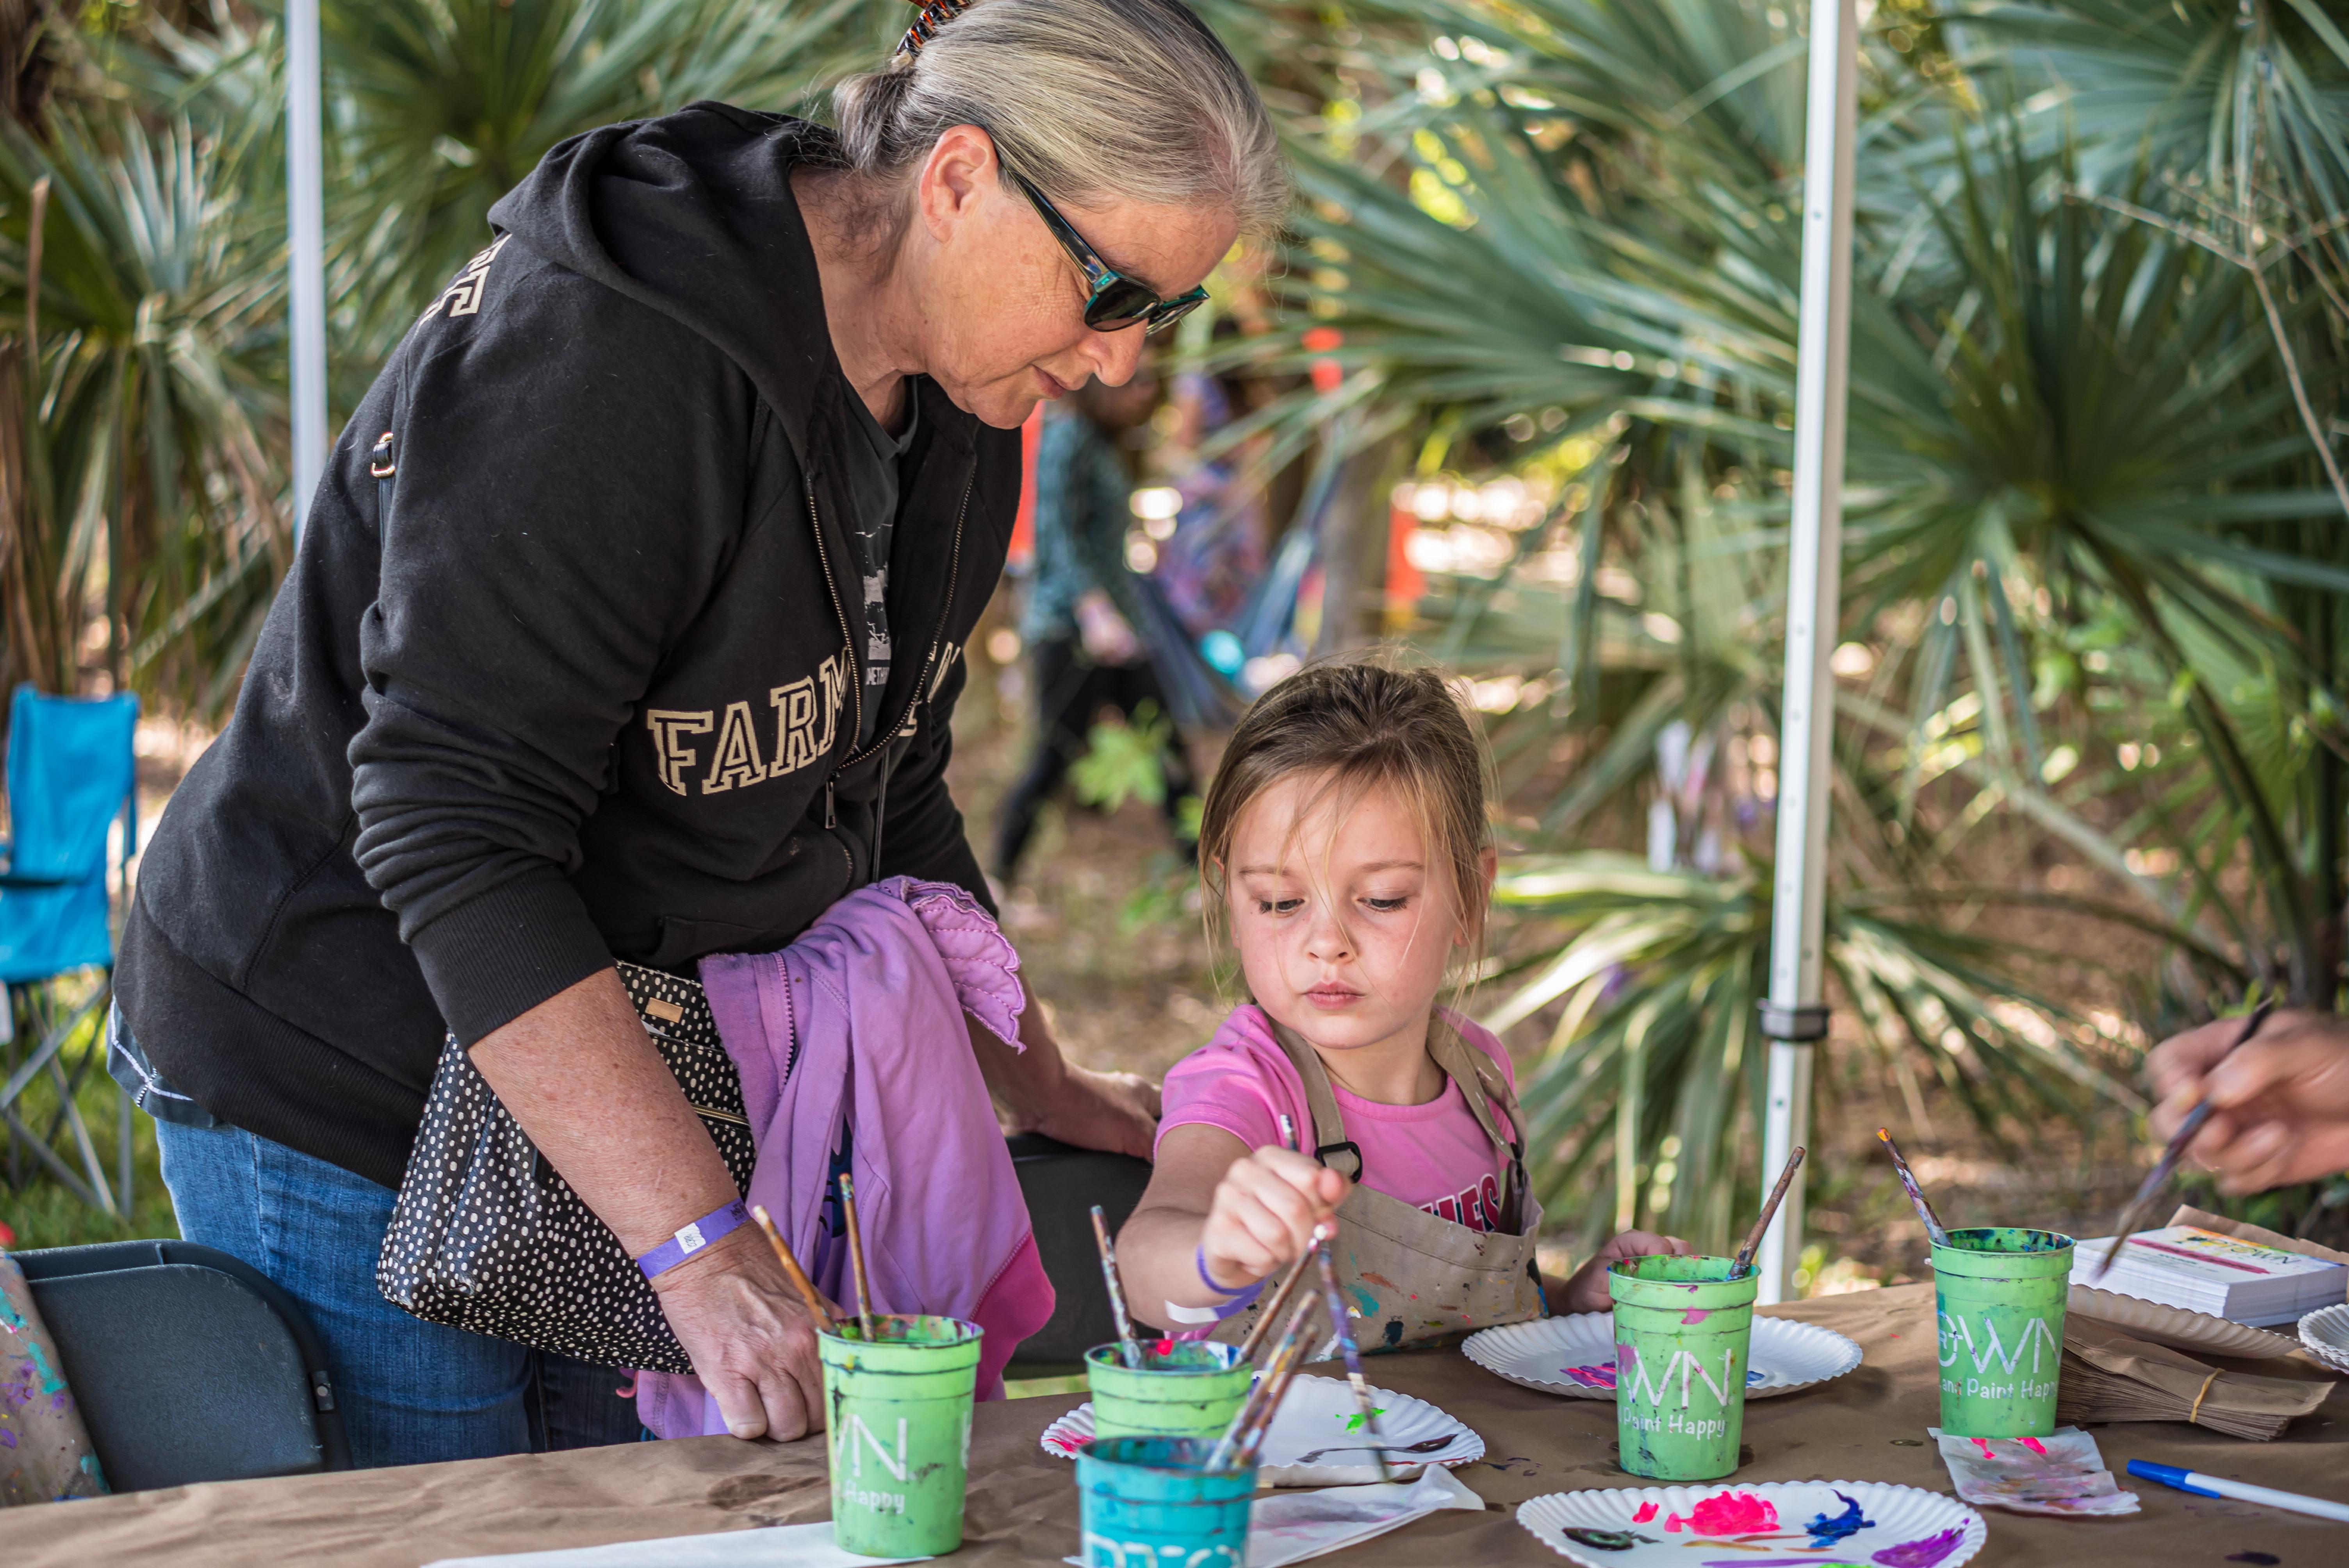 mom and kid doing art